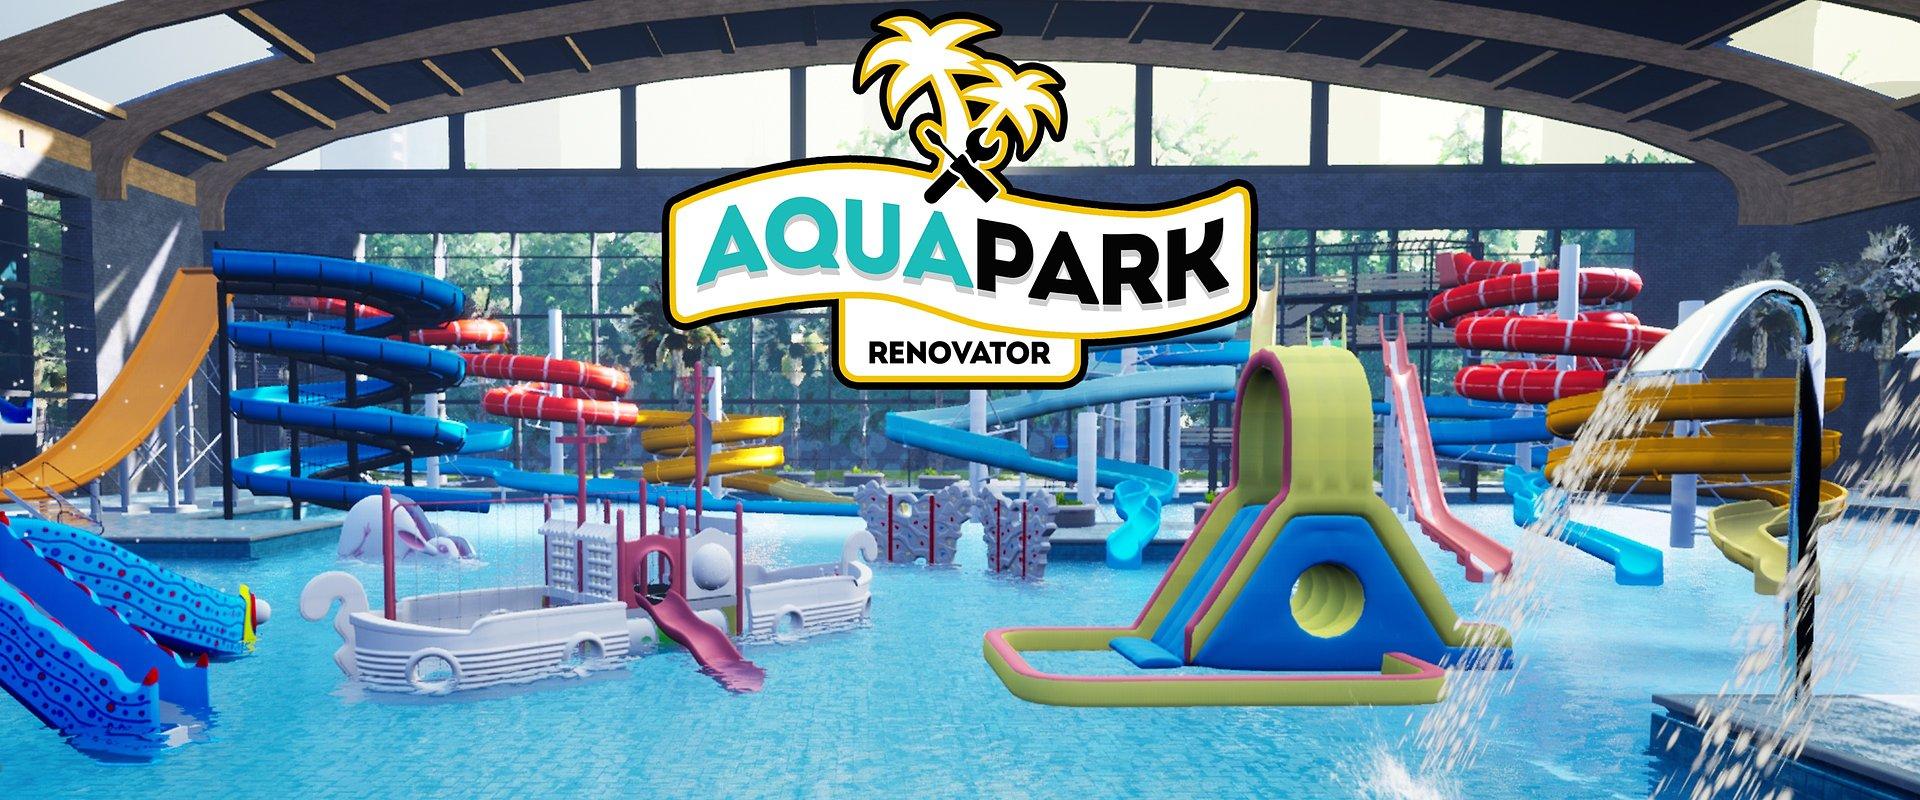 Piąta zapowiedź symulatora od The Dust - Aquapark Renovator.